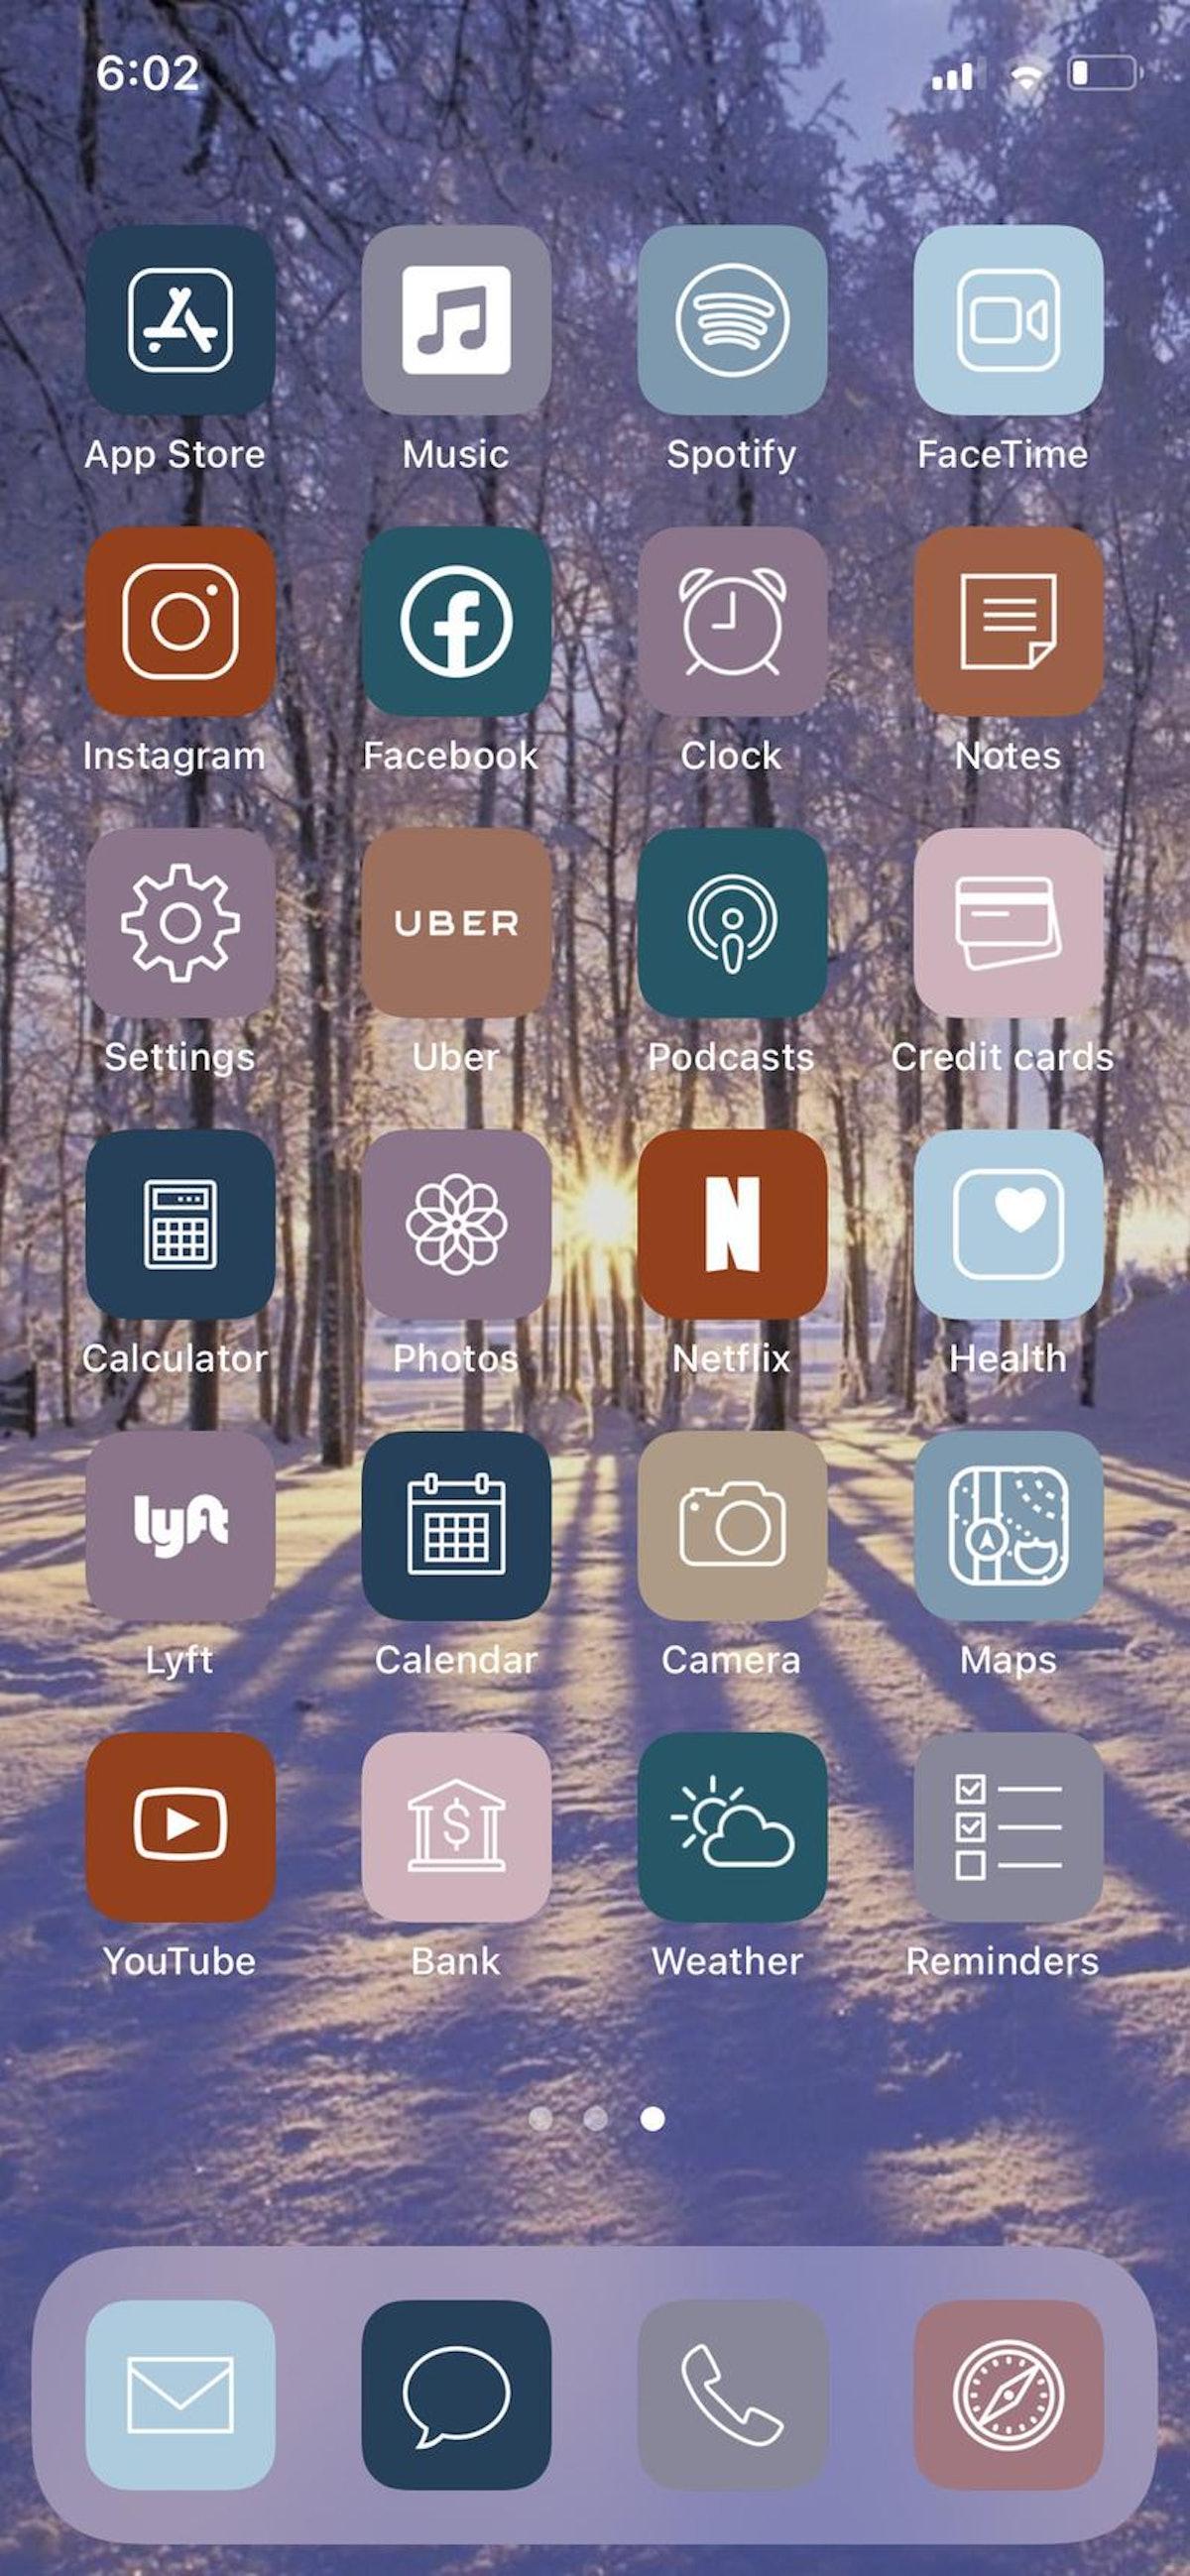 Cozy Winter iOS 14 Home Screen Design Pack